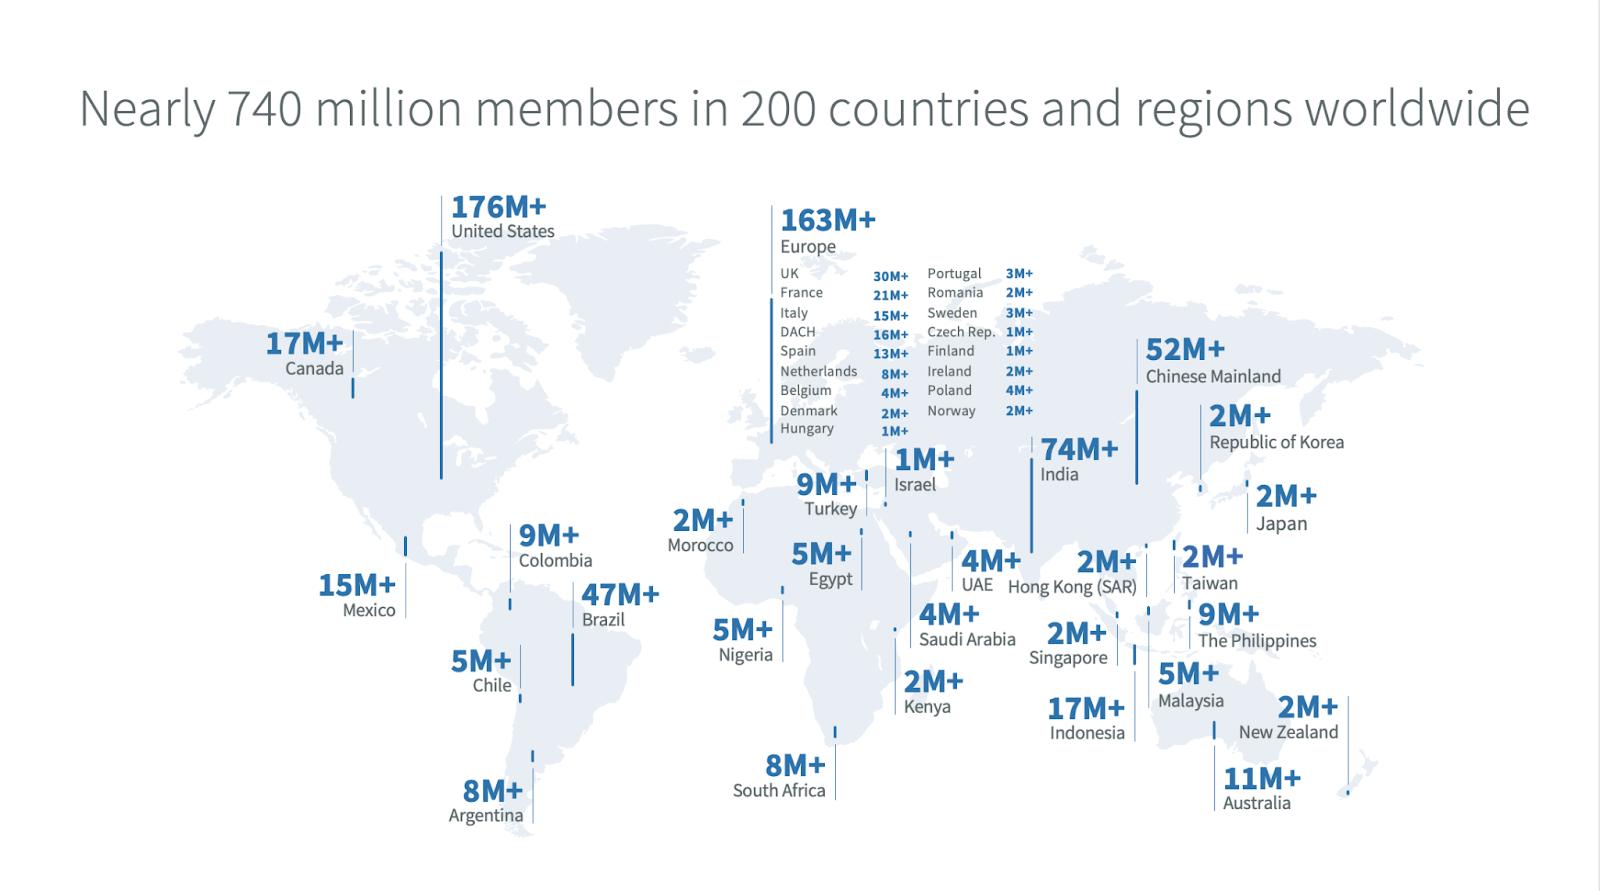 LinkedIn Q2 21 Membership breakdown global-min